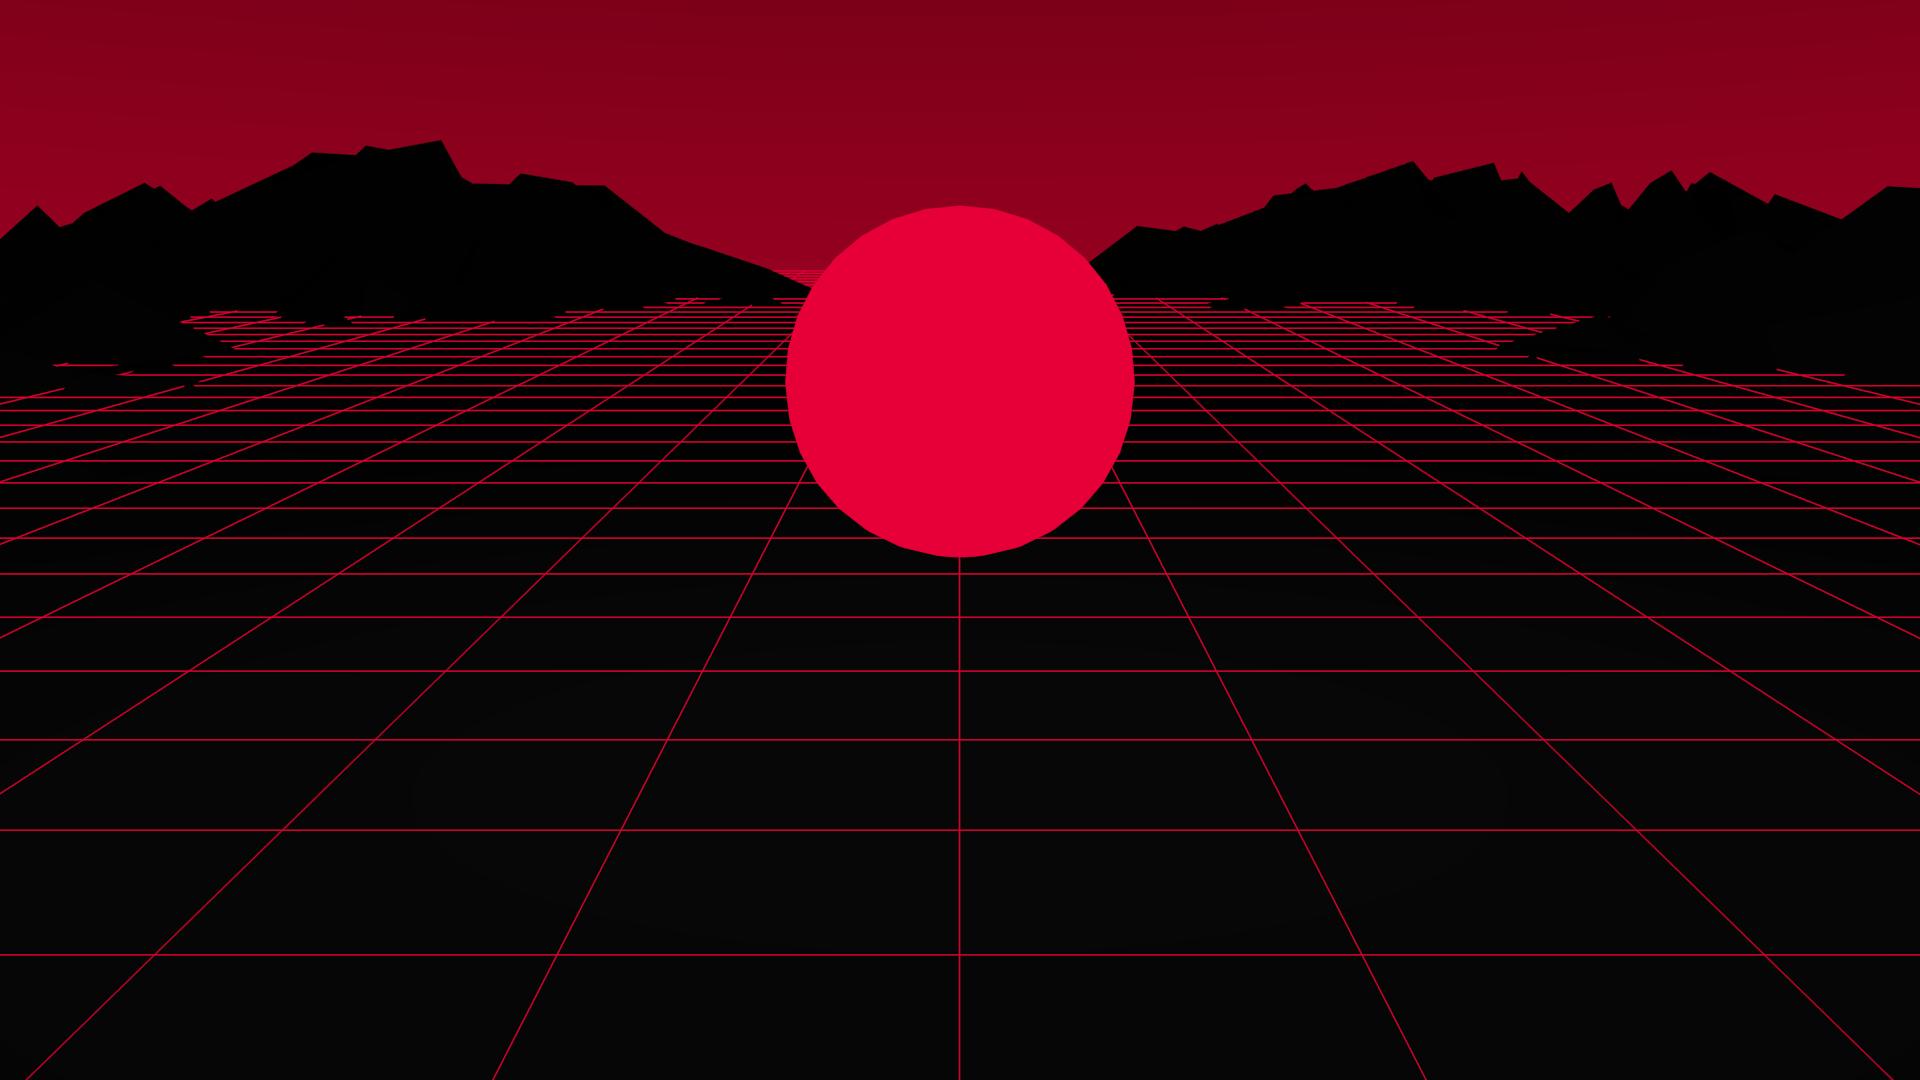 80s Aesthetic Wallpaper Red - Red Aesthetic Background Desktop - HD Wallpaper